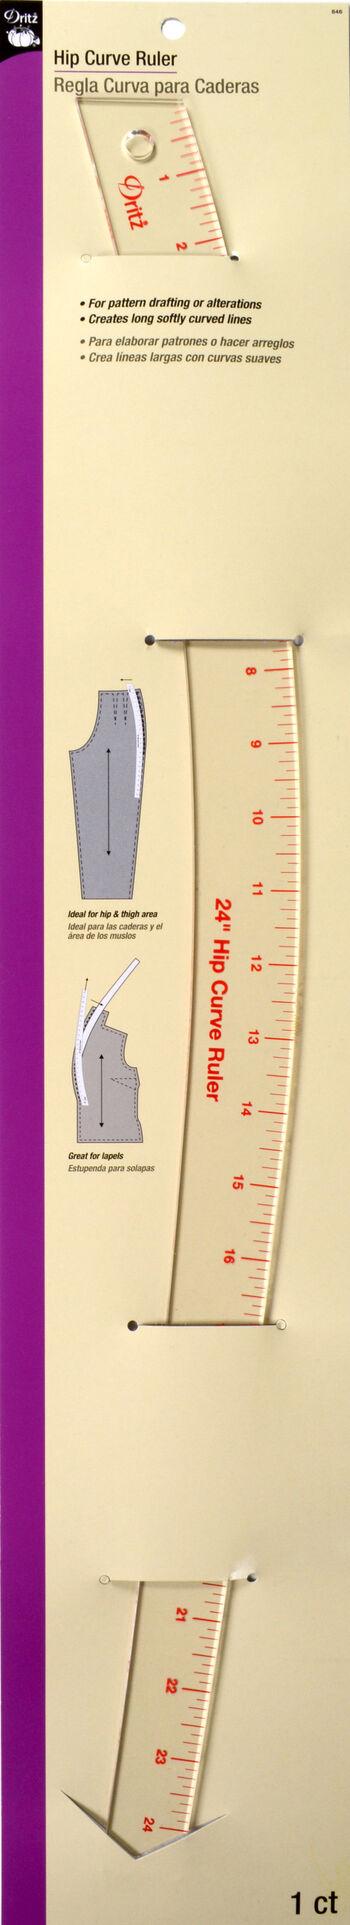 Hip Curve Ruler